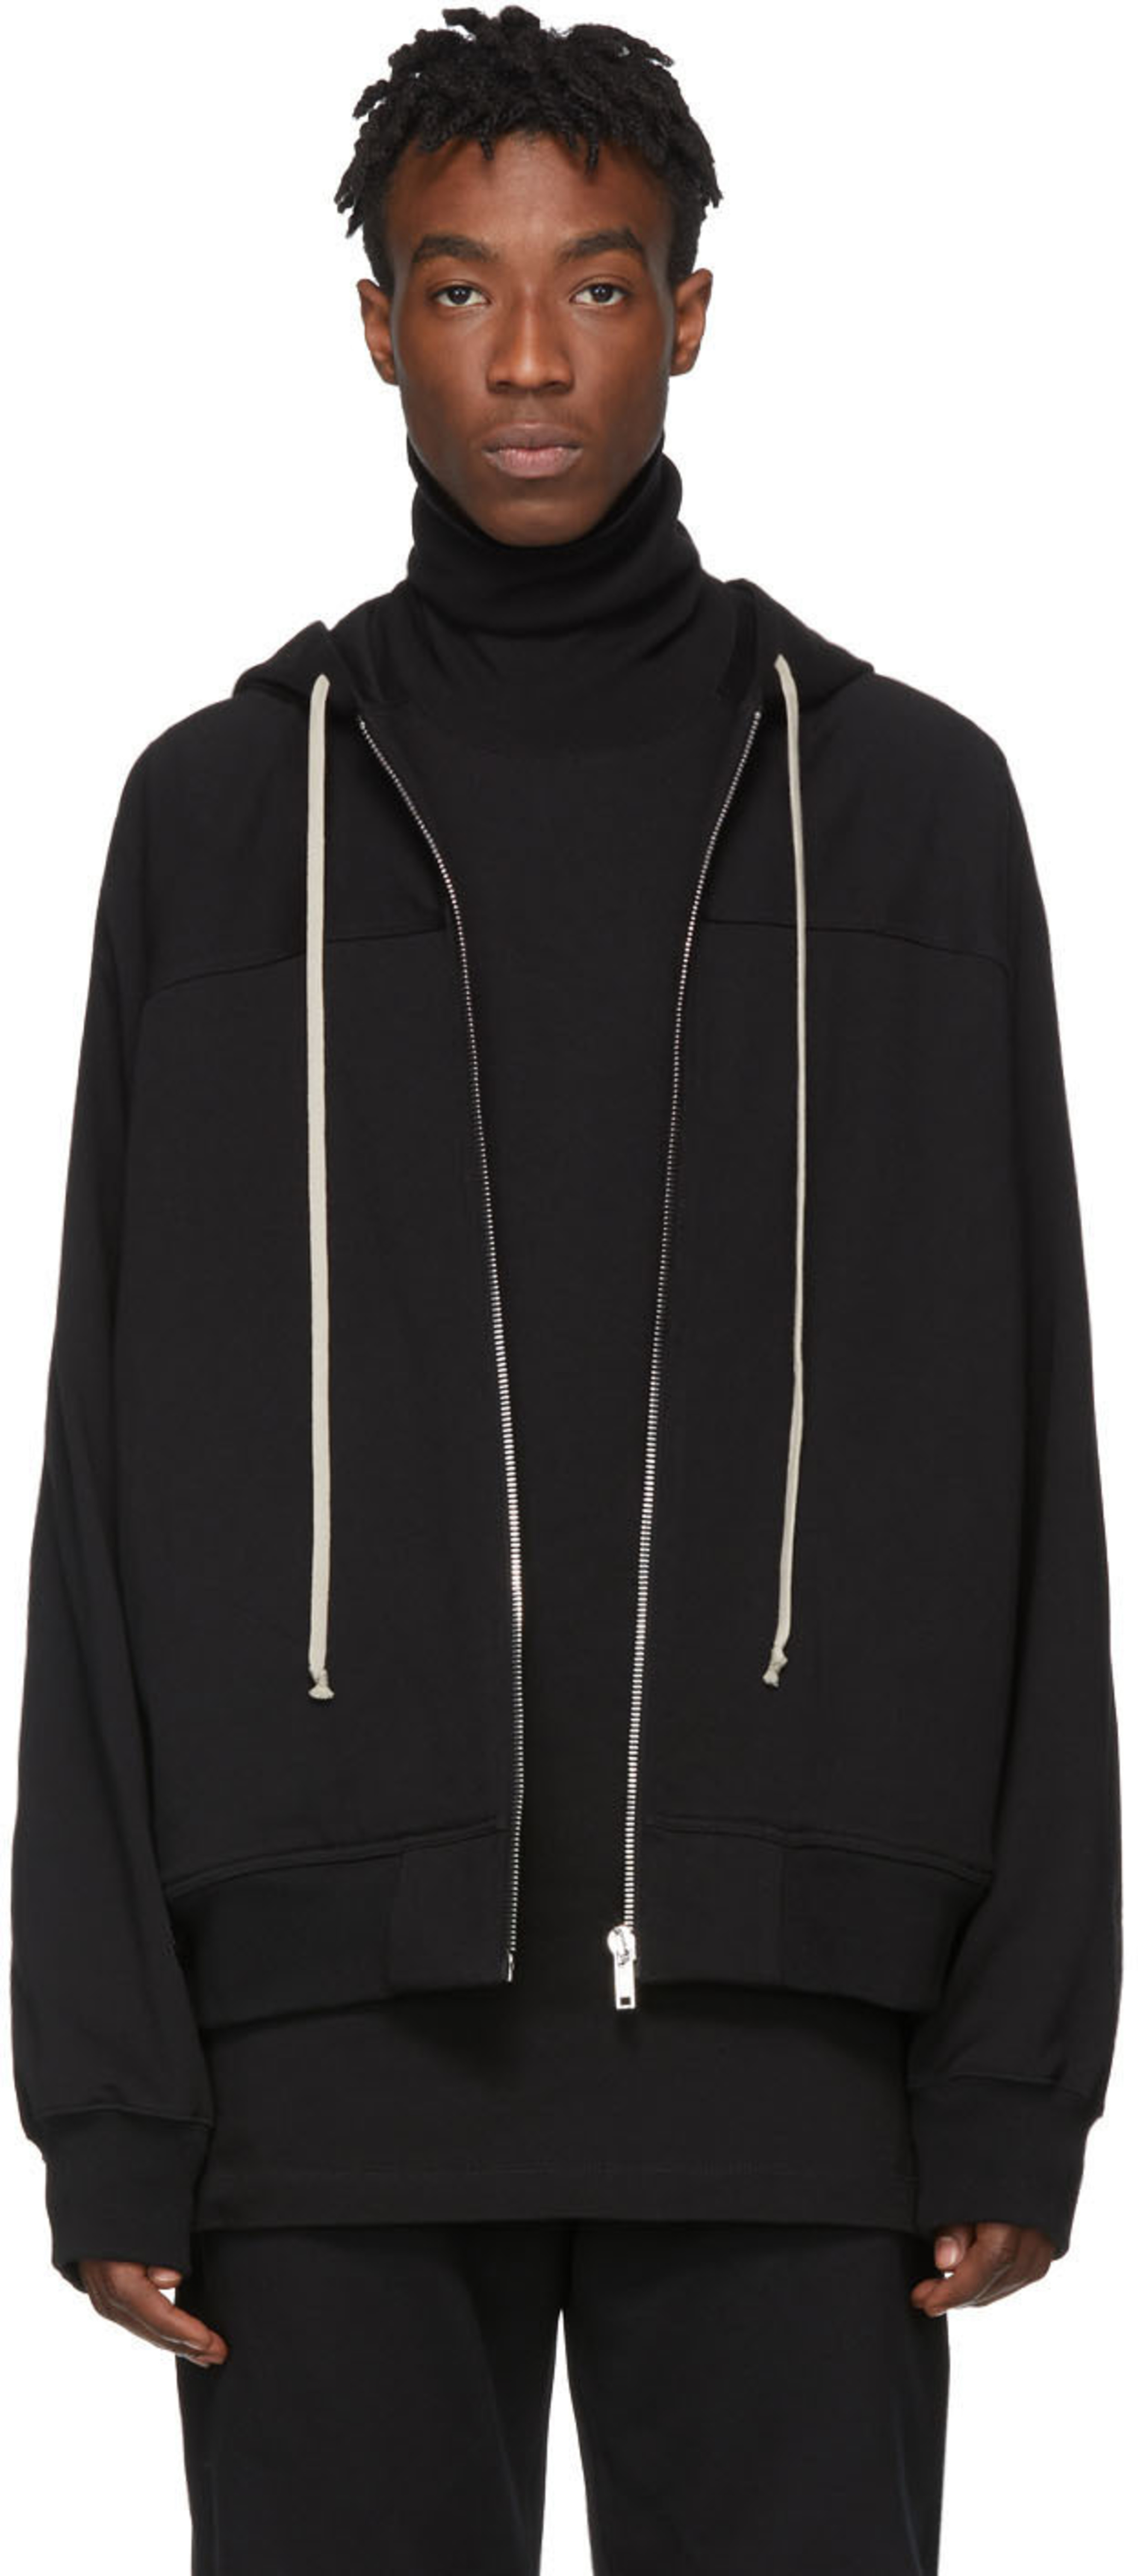 4133e4cea Designer hoodies   zipups for Men